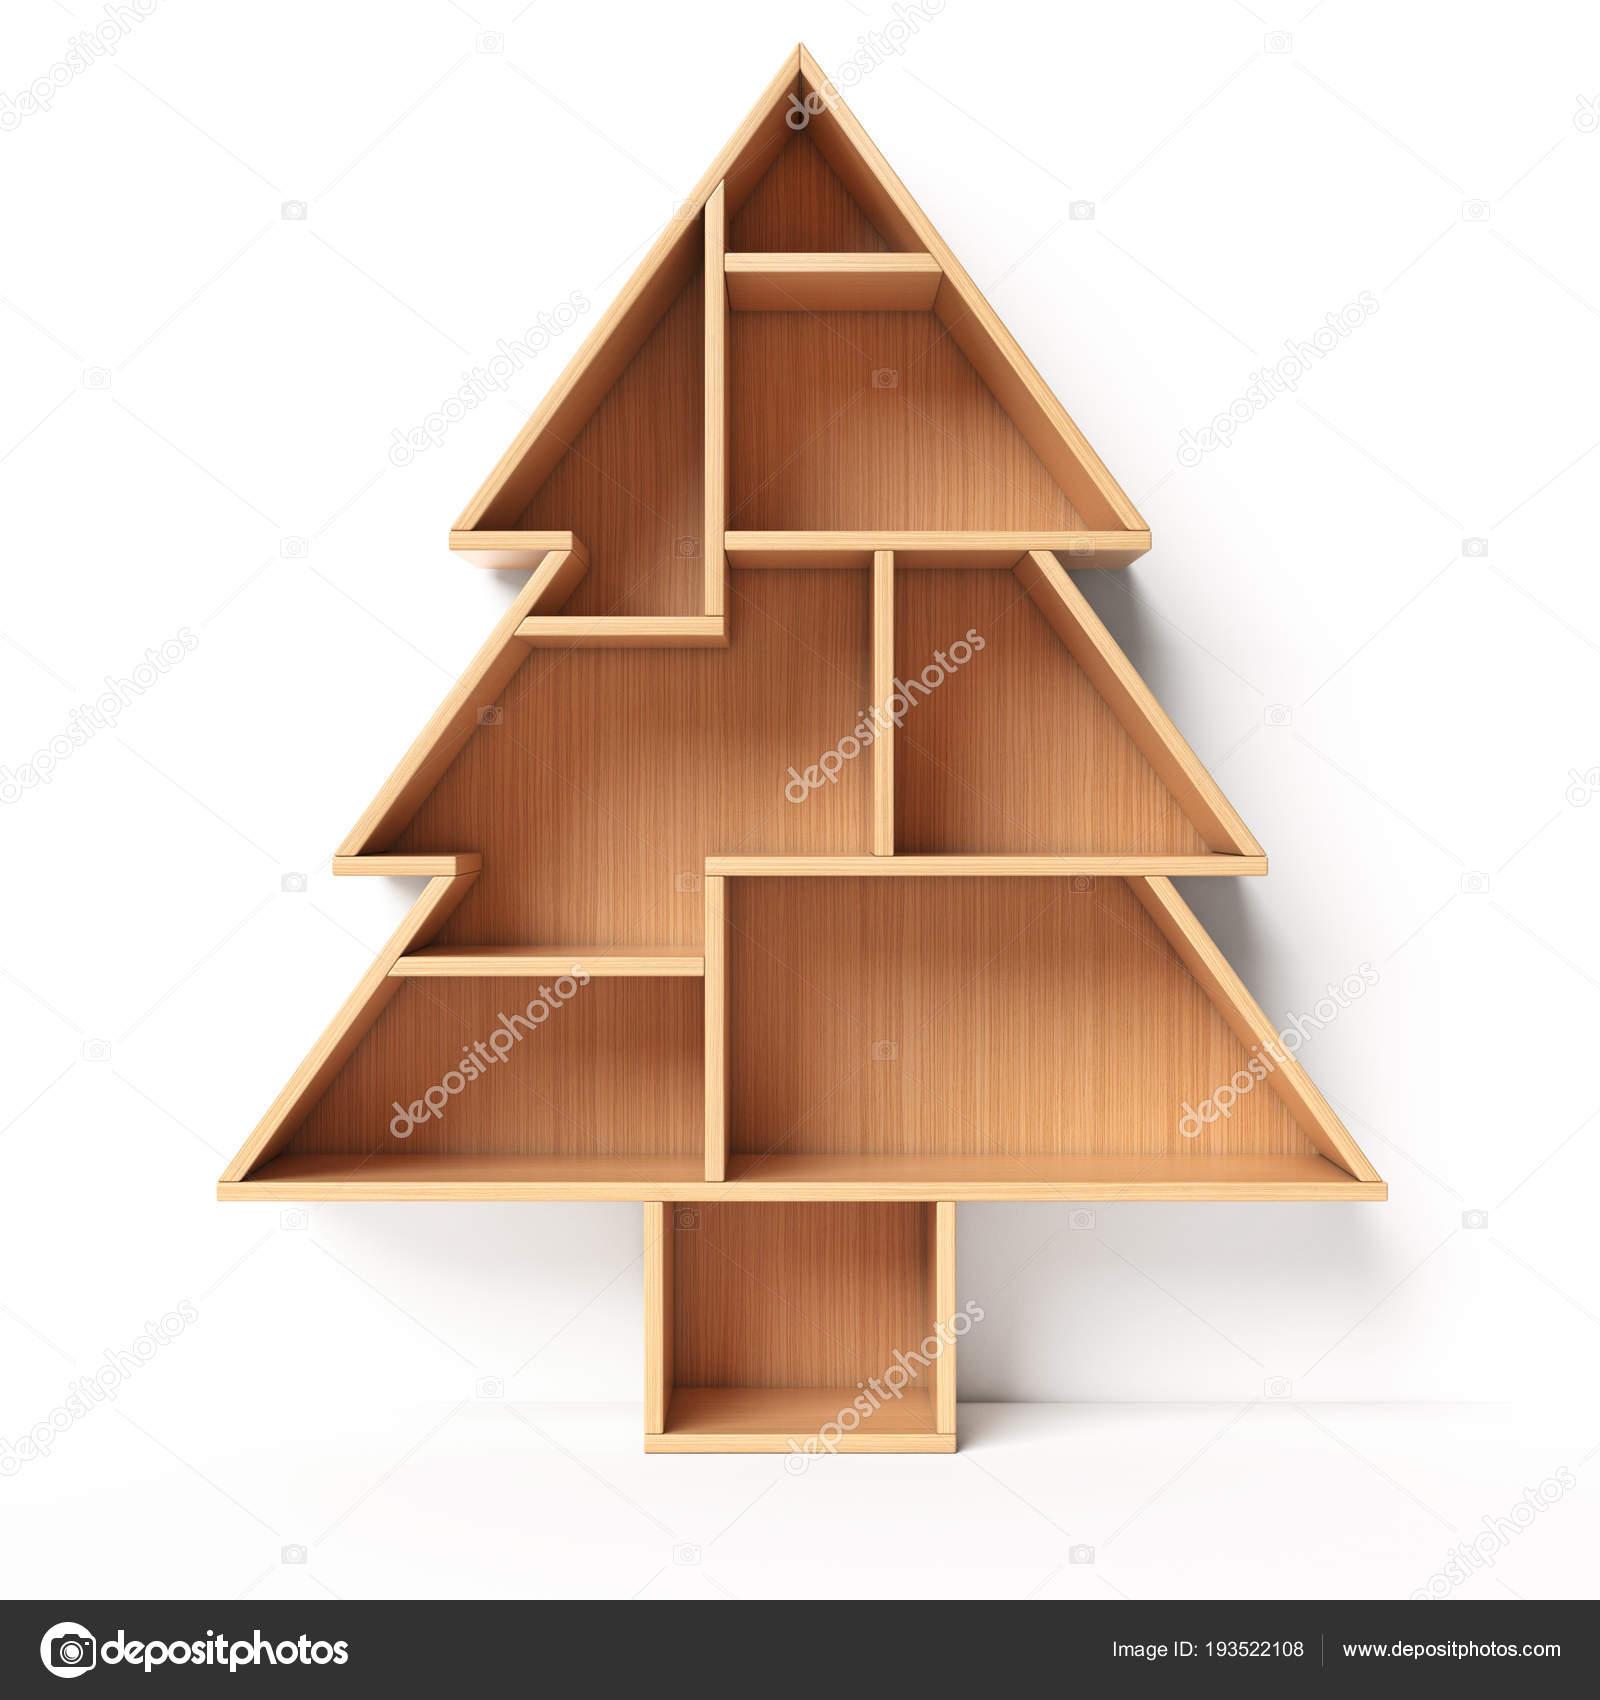 Bookshelves In The Shape Of Christmas Tree Xmas Present Book Shelf Concept 3d Rendering Photo By Koya979